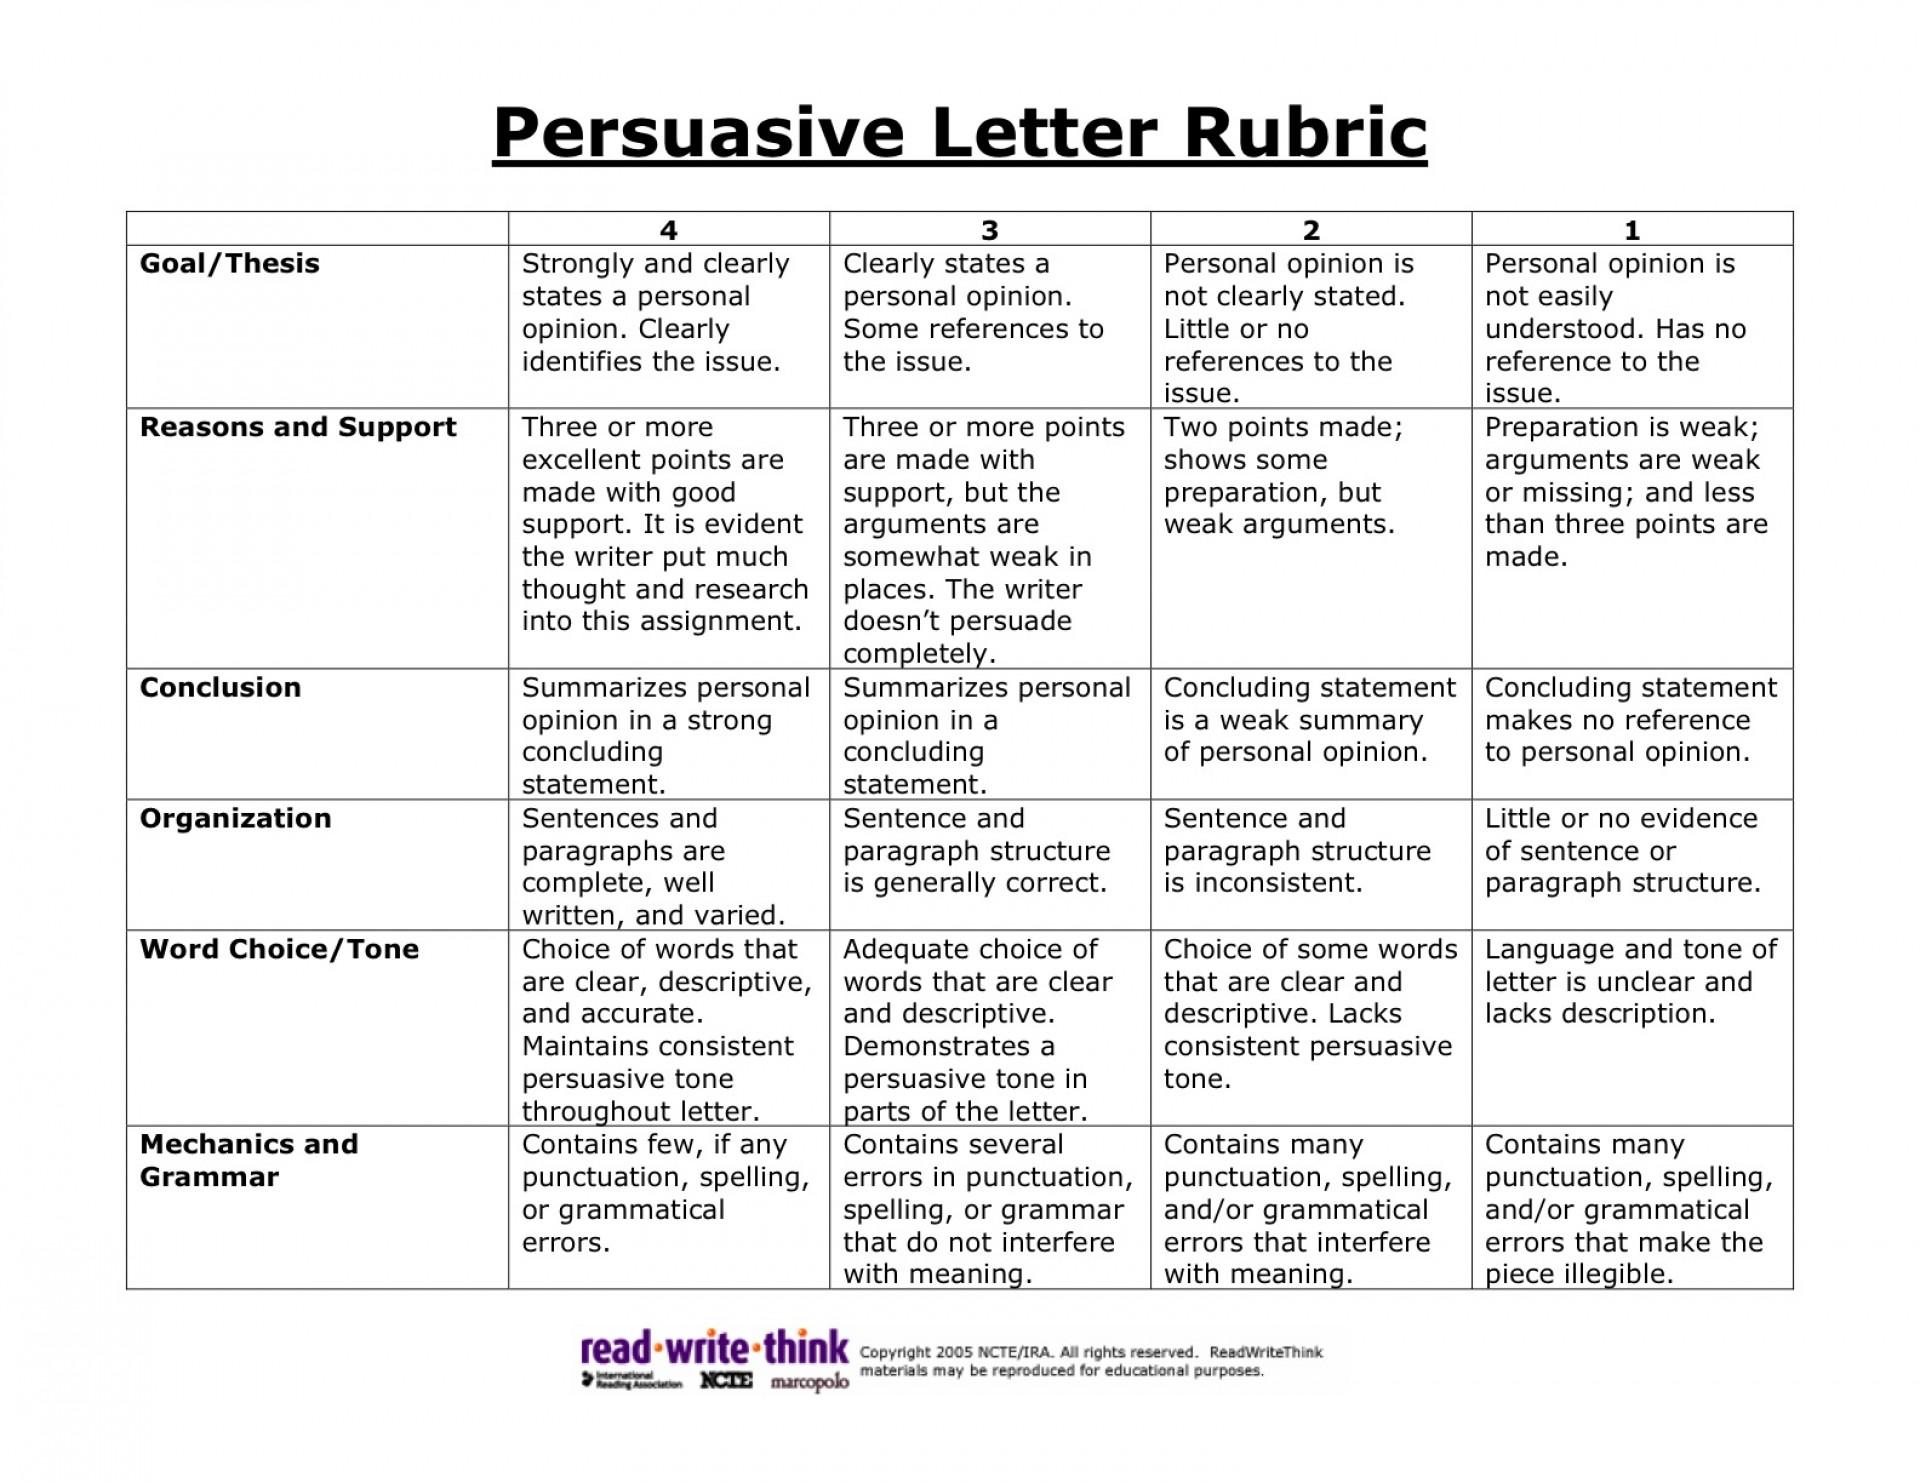 016 Persuasive2brubric Persuasive Essay Topics For Middle School Imposing Prompts Argumentative High Pdf 1920